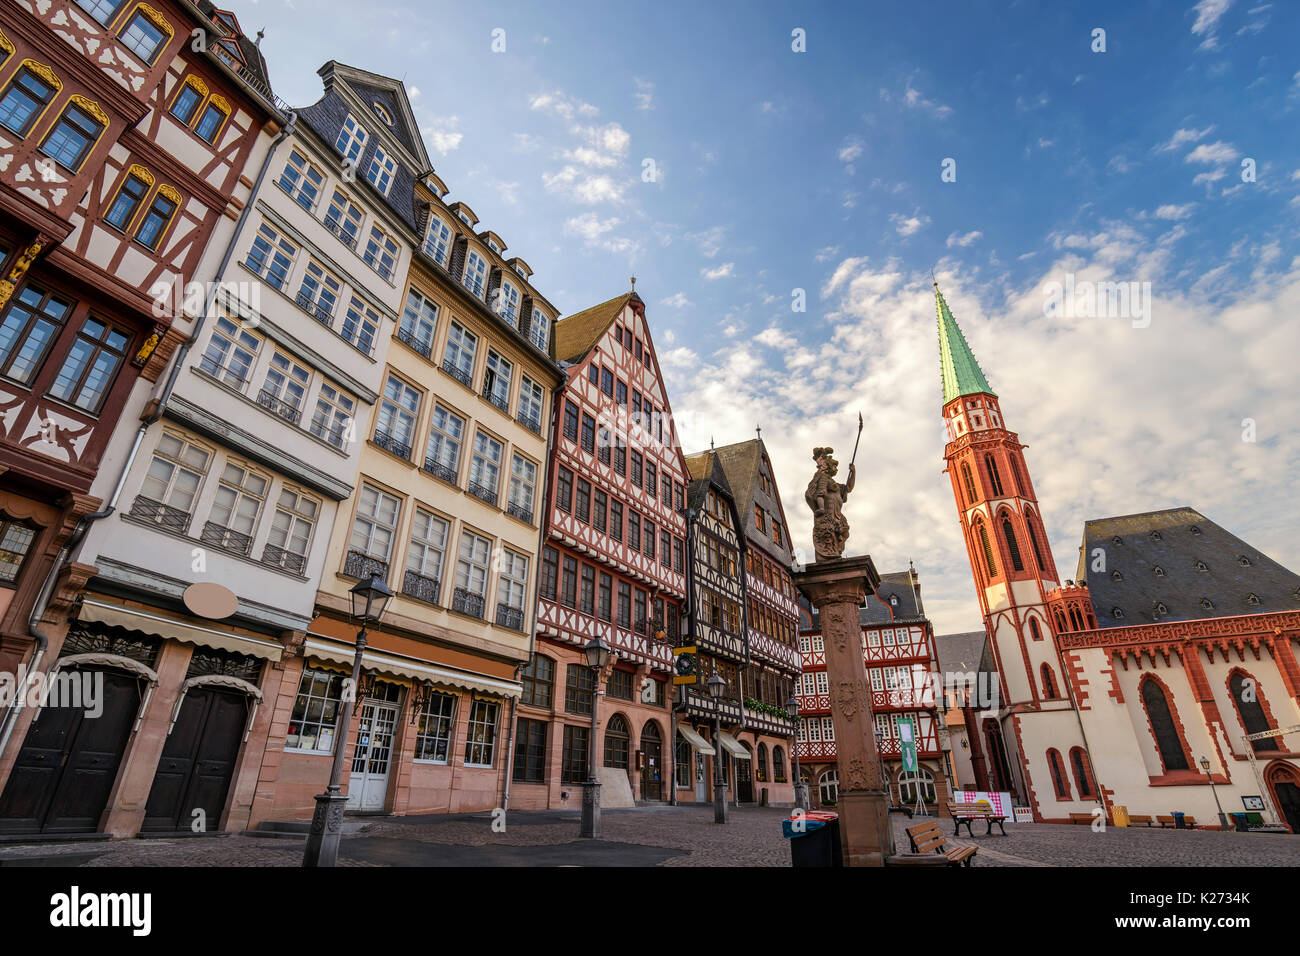 Romer (Frankfurt City Hall), Francfort, Allemagne Photo Stock